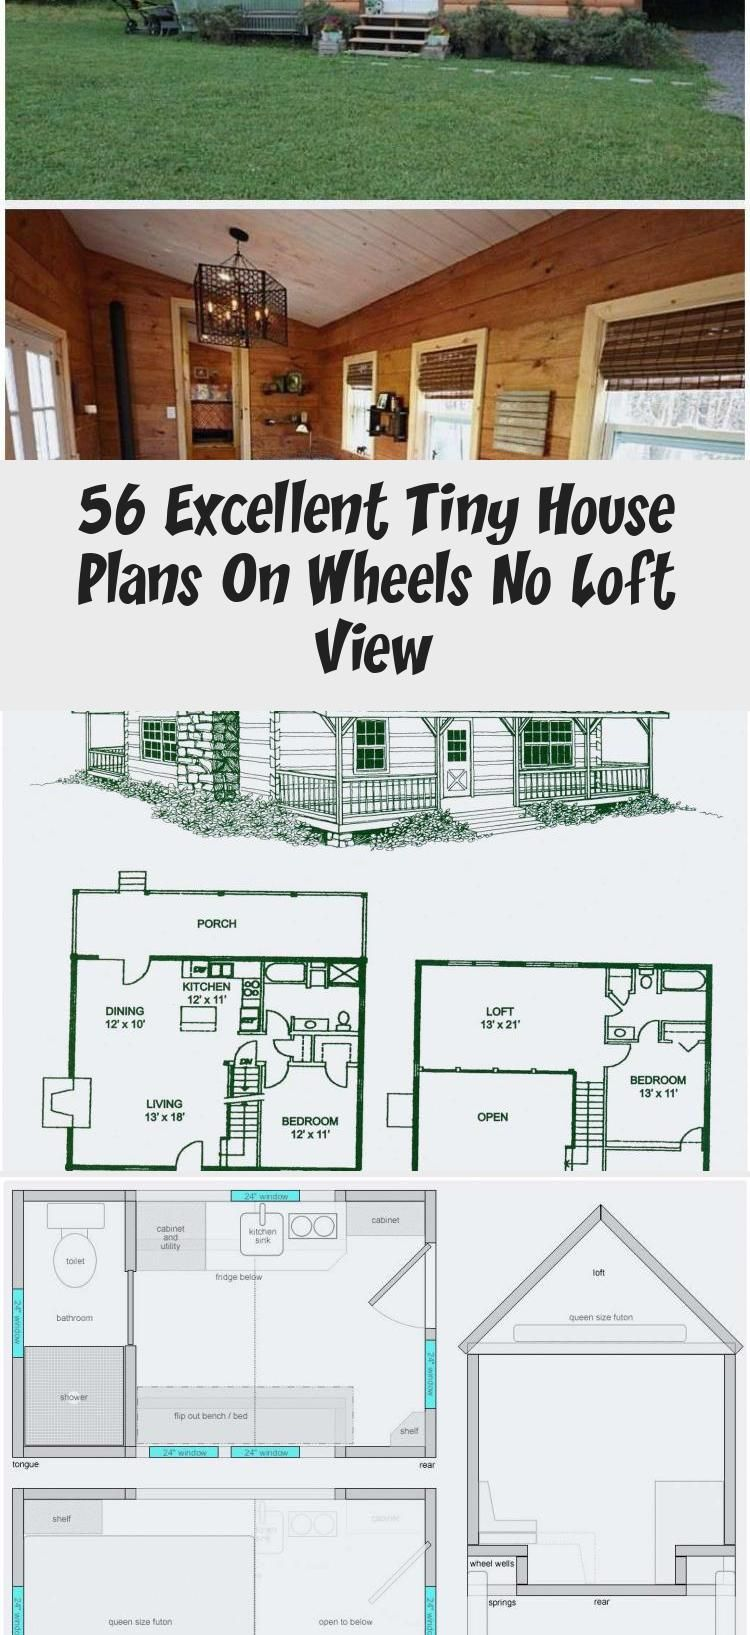 Tiny House Wheels Floor Plans With No Loft Luxury Small House Open Floor Plan New Tinyhouseplansblueprints Tinyhouseplanscraftsma